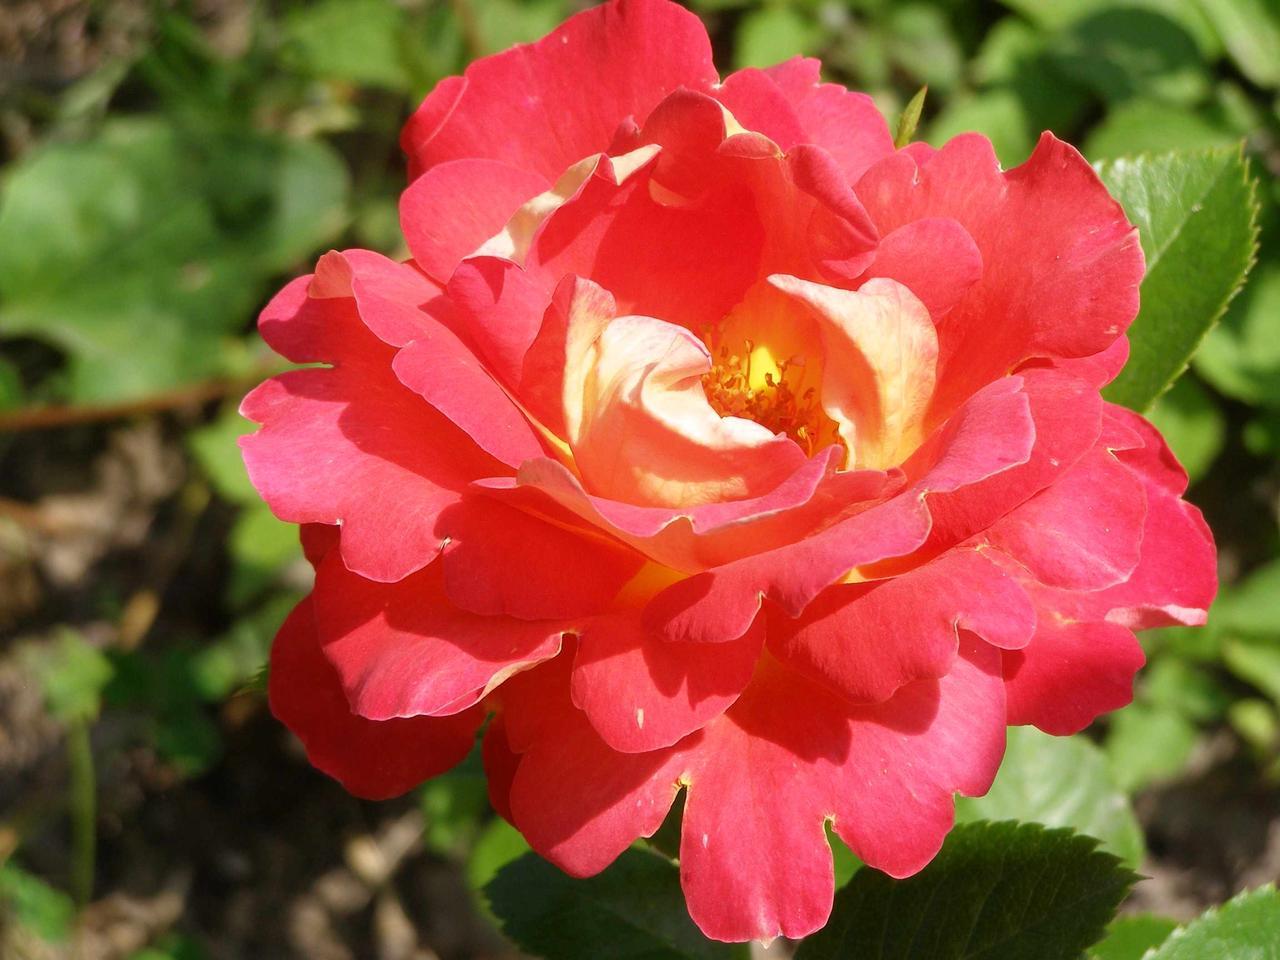 Роза Декор Арлекин (Decor Arlequin/Павлиний Глаз) Плетистая